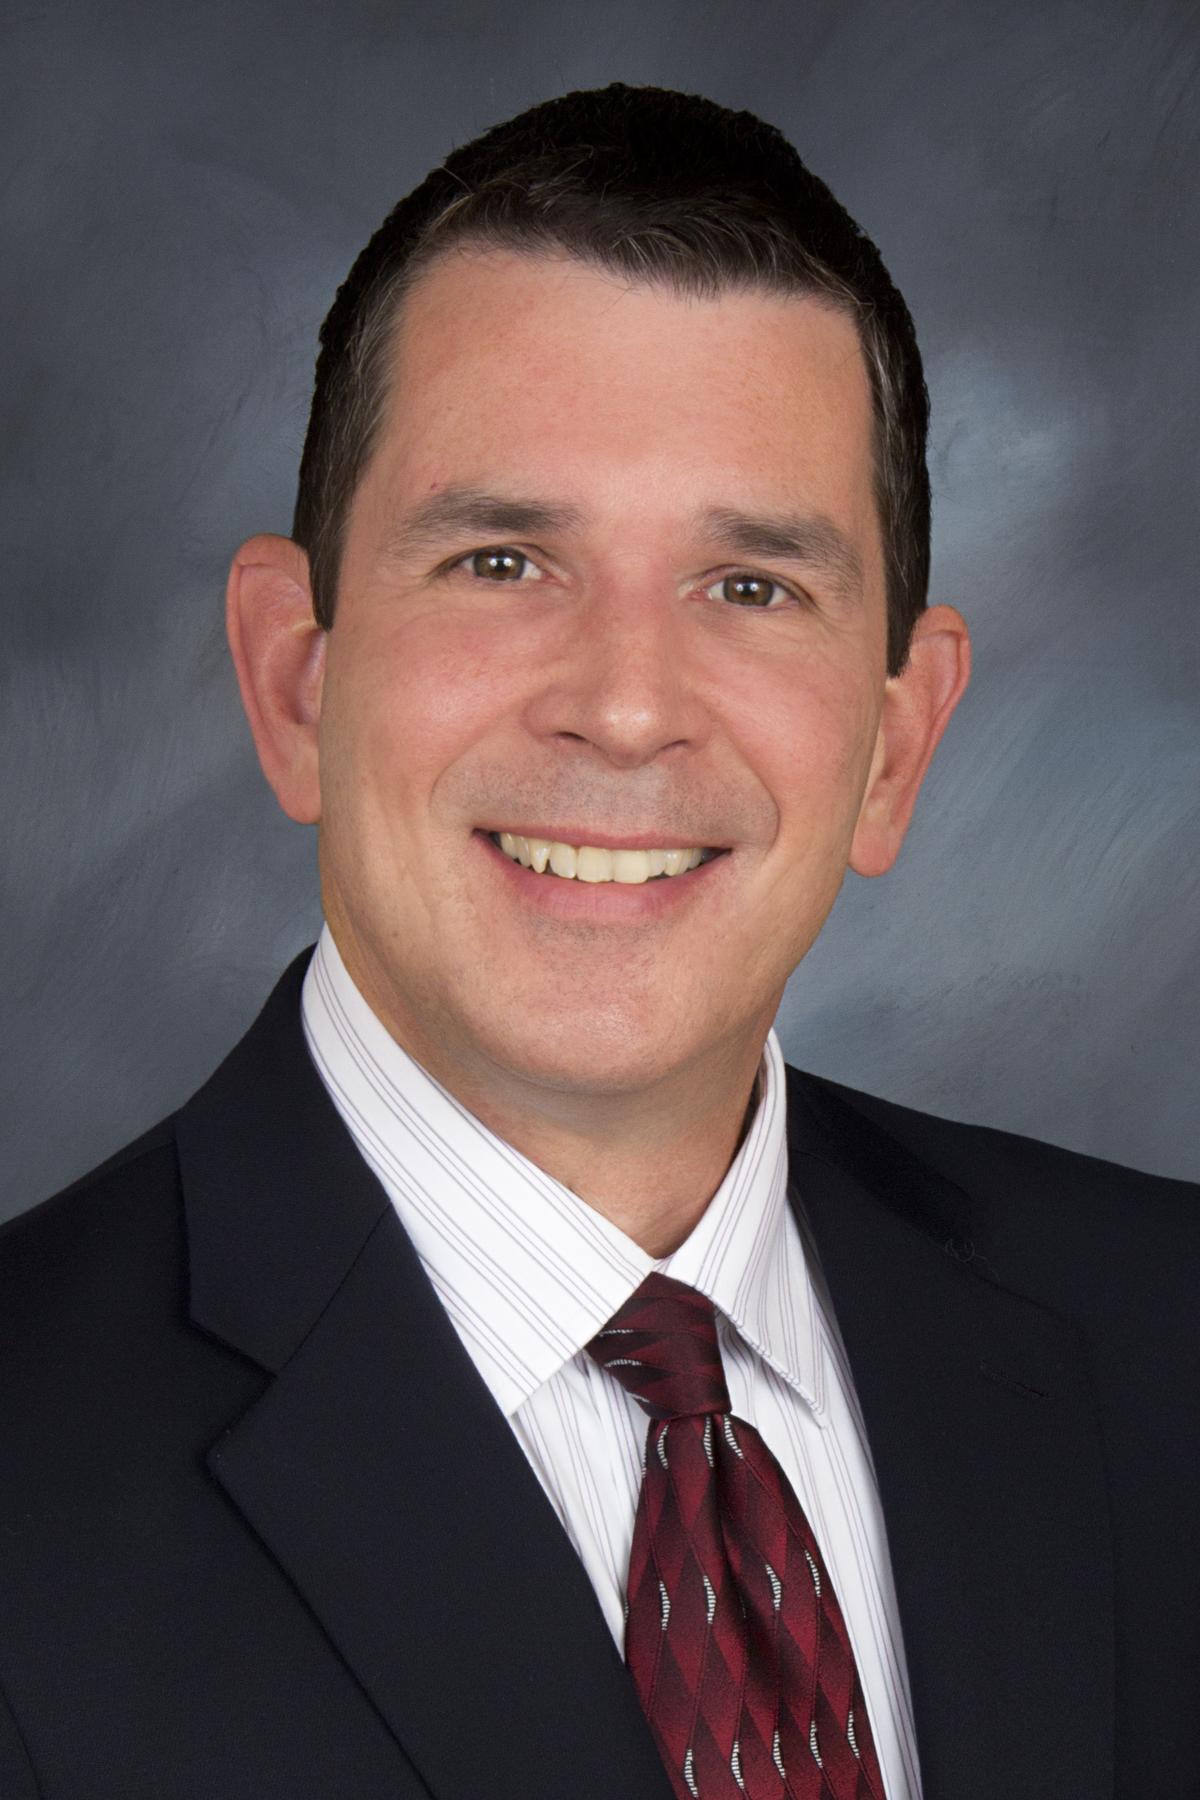 Robert Lomonico